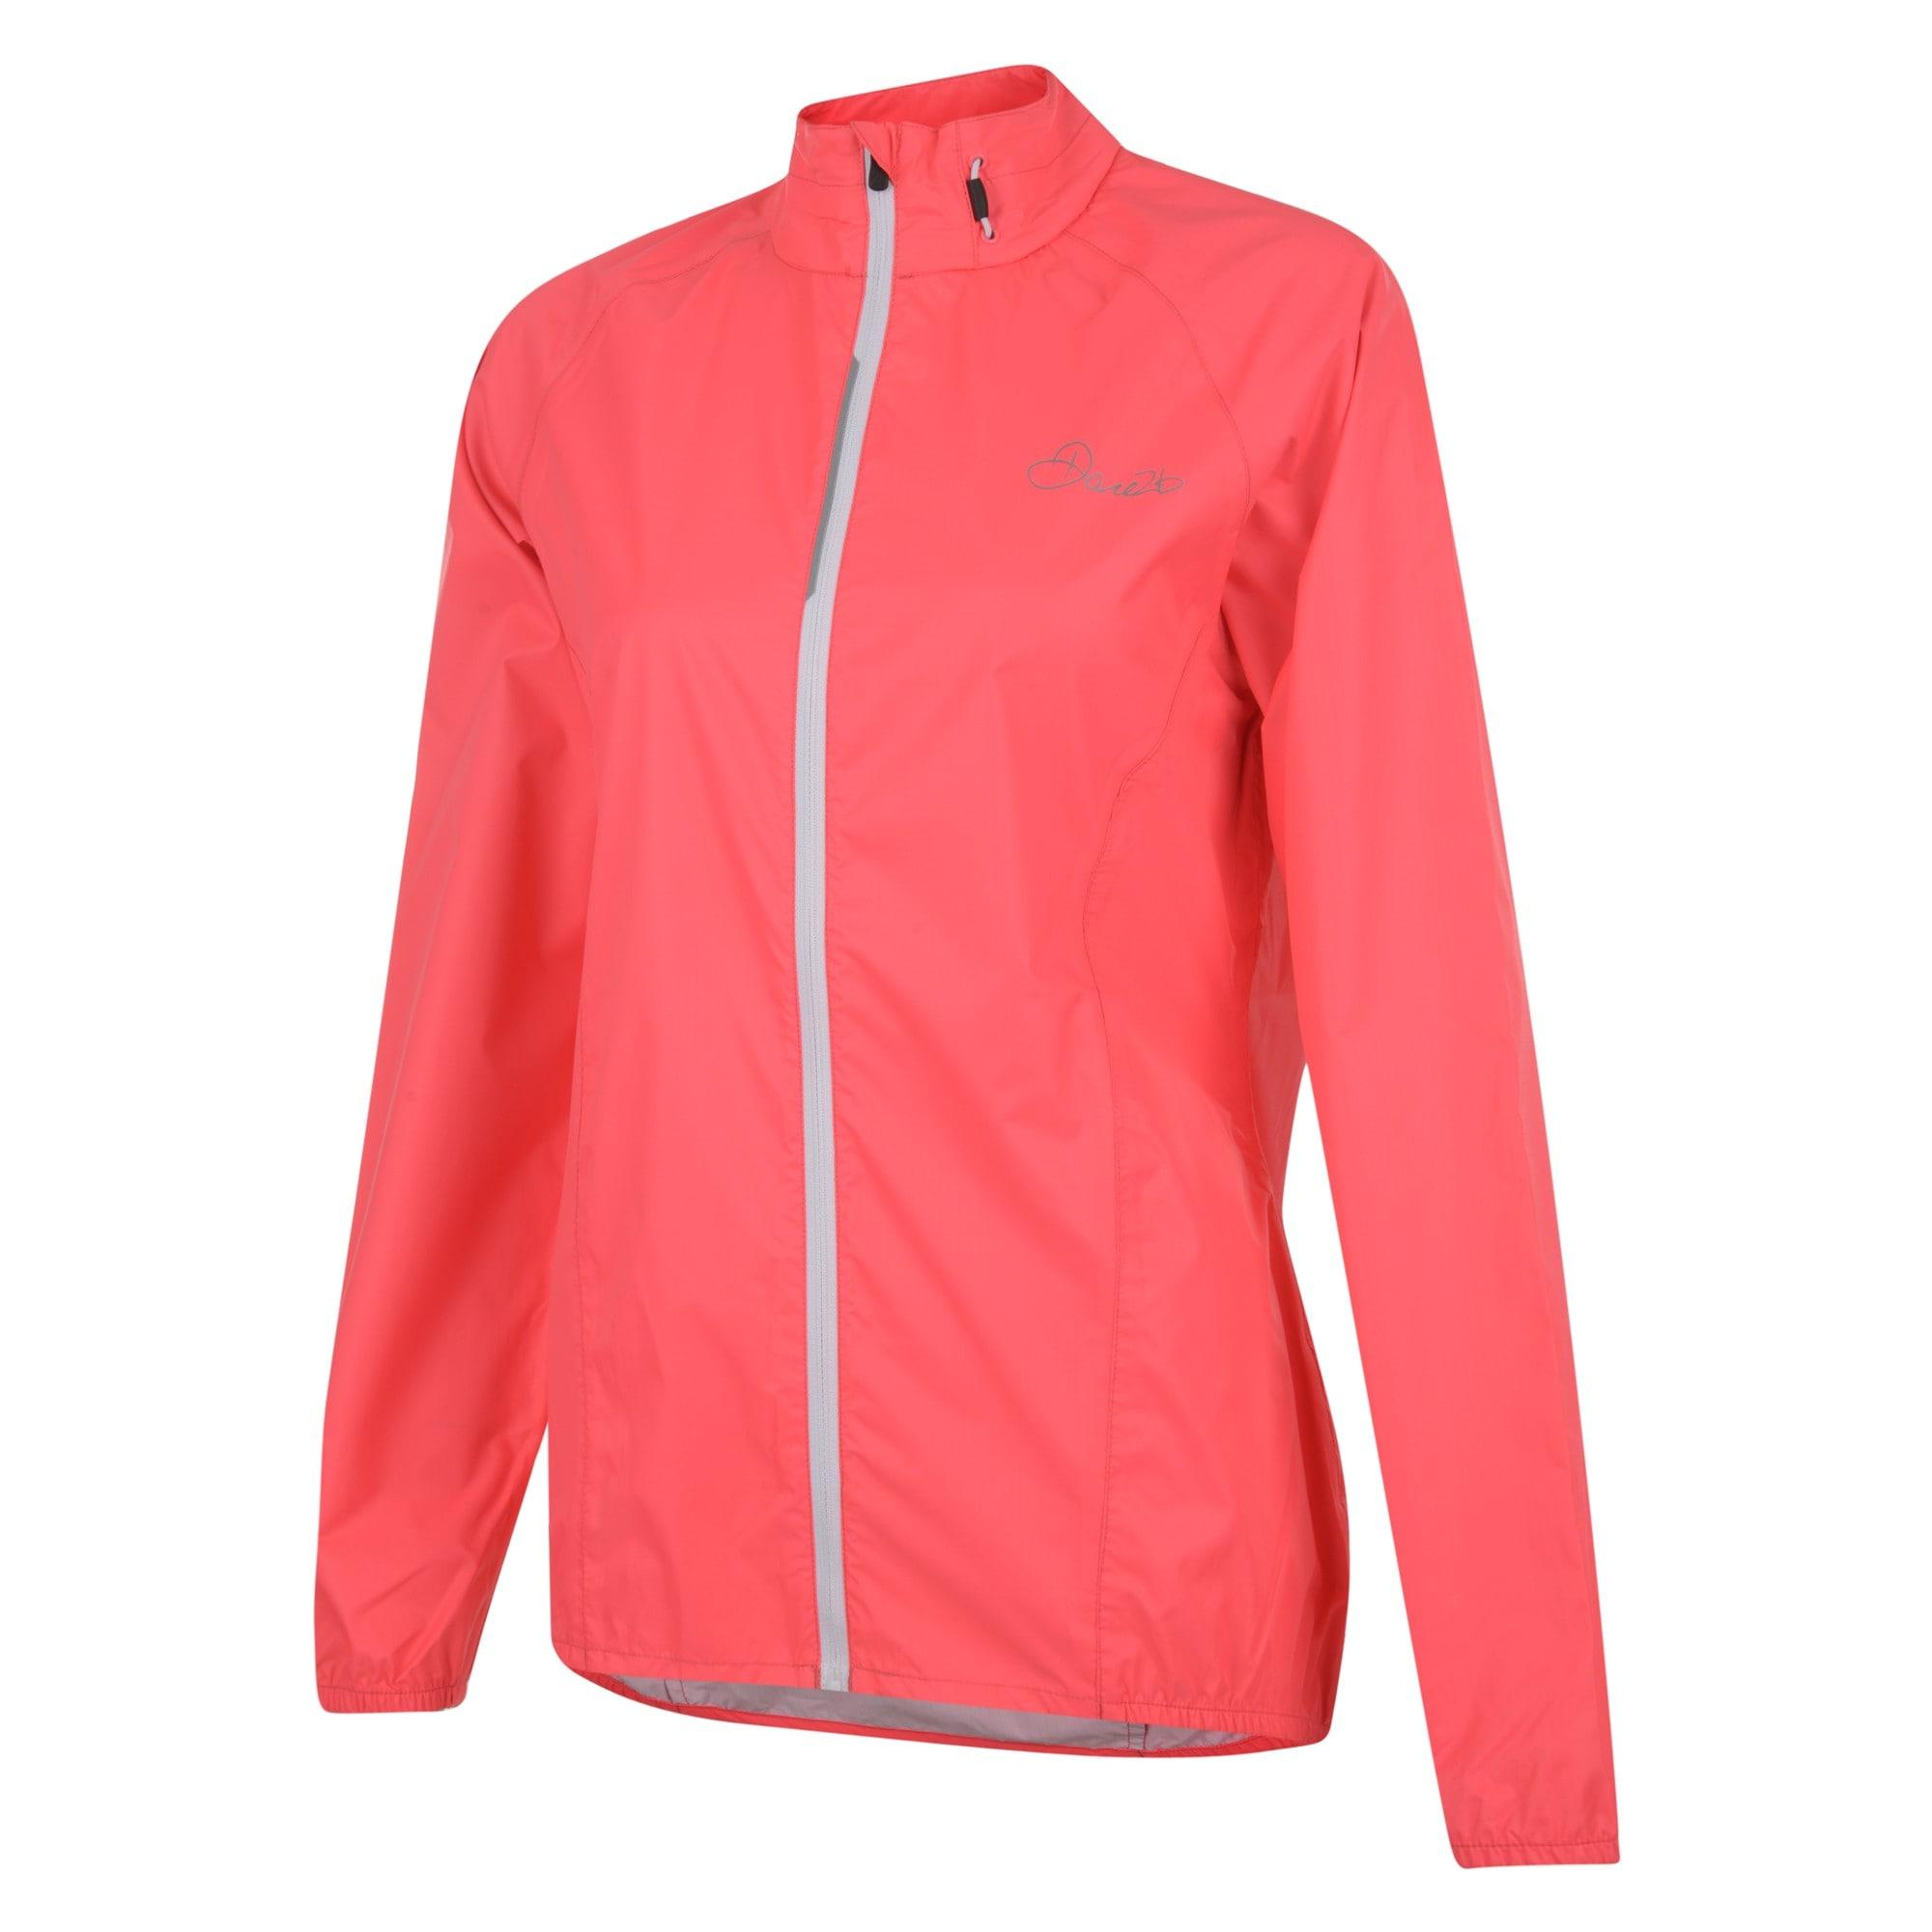 Dare2b Outdoorjacke Damen Evident II Jacke leicht